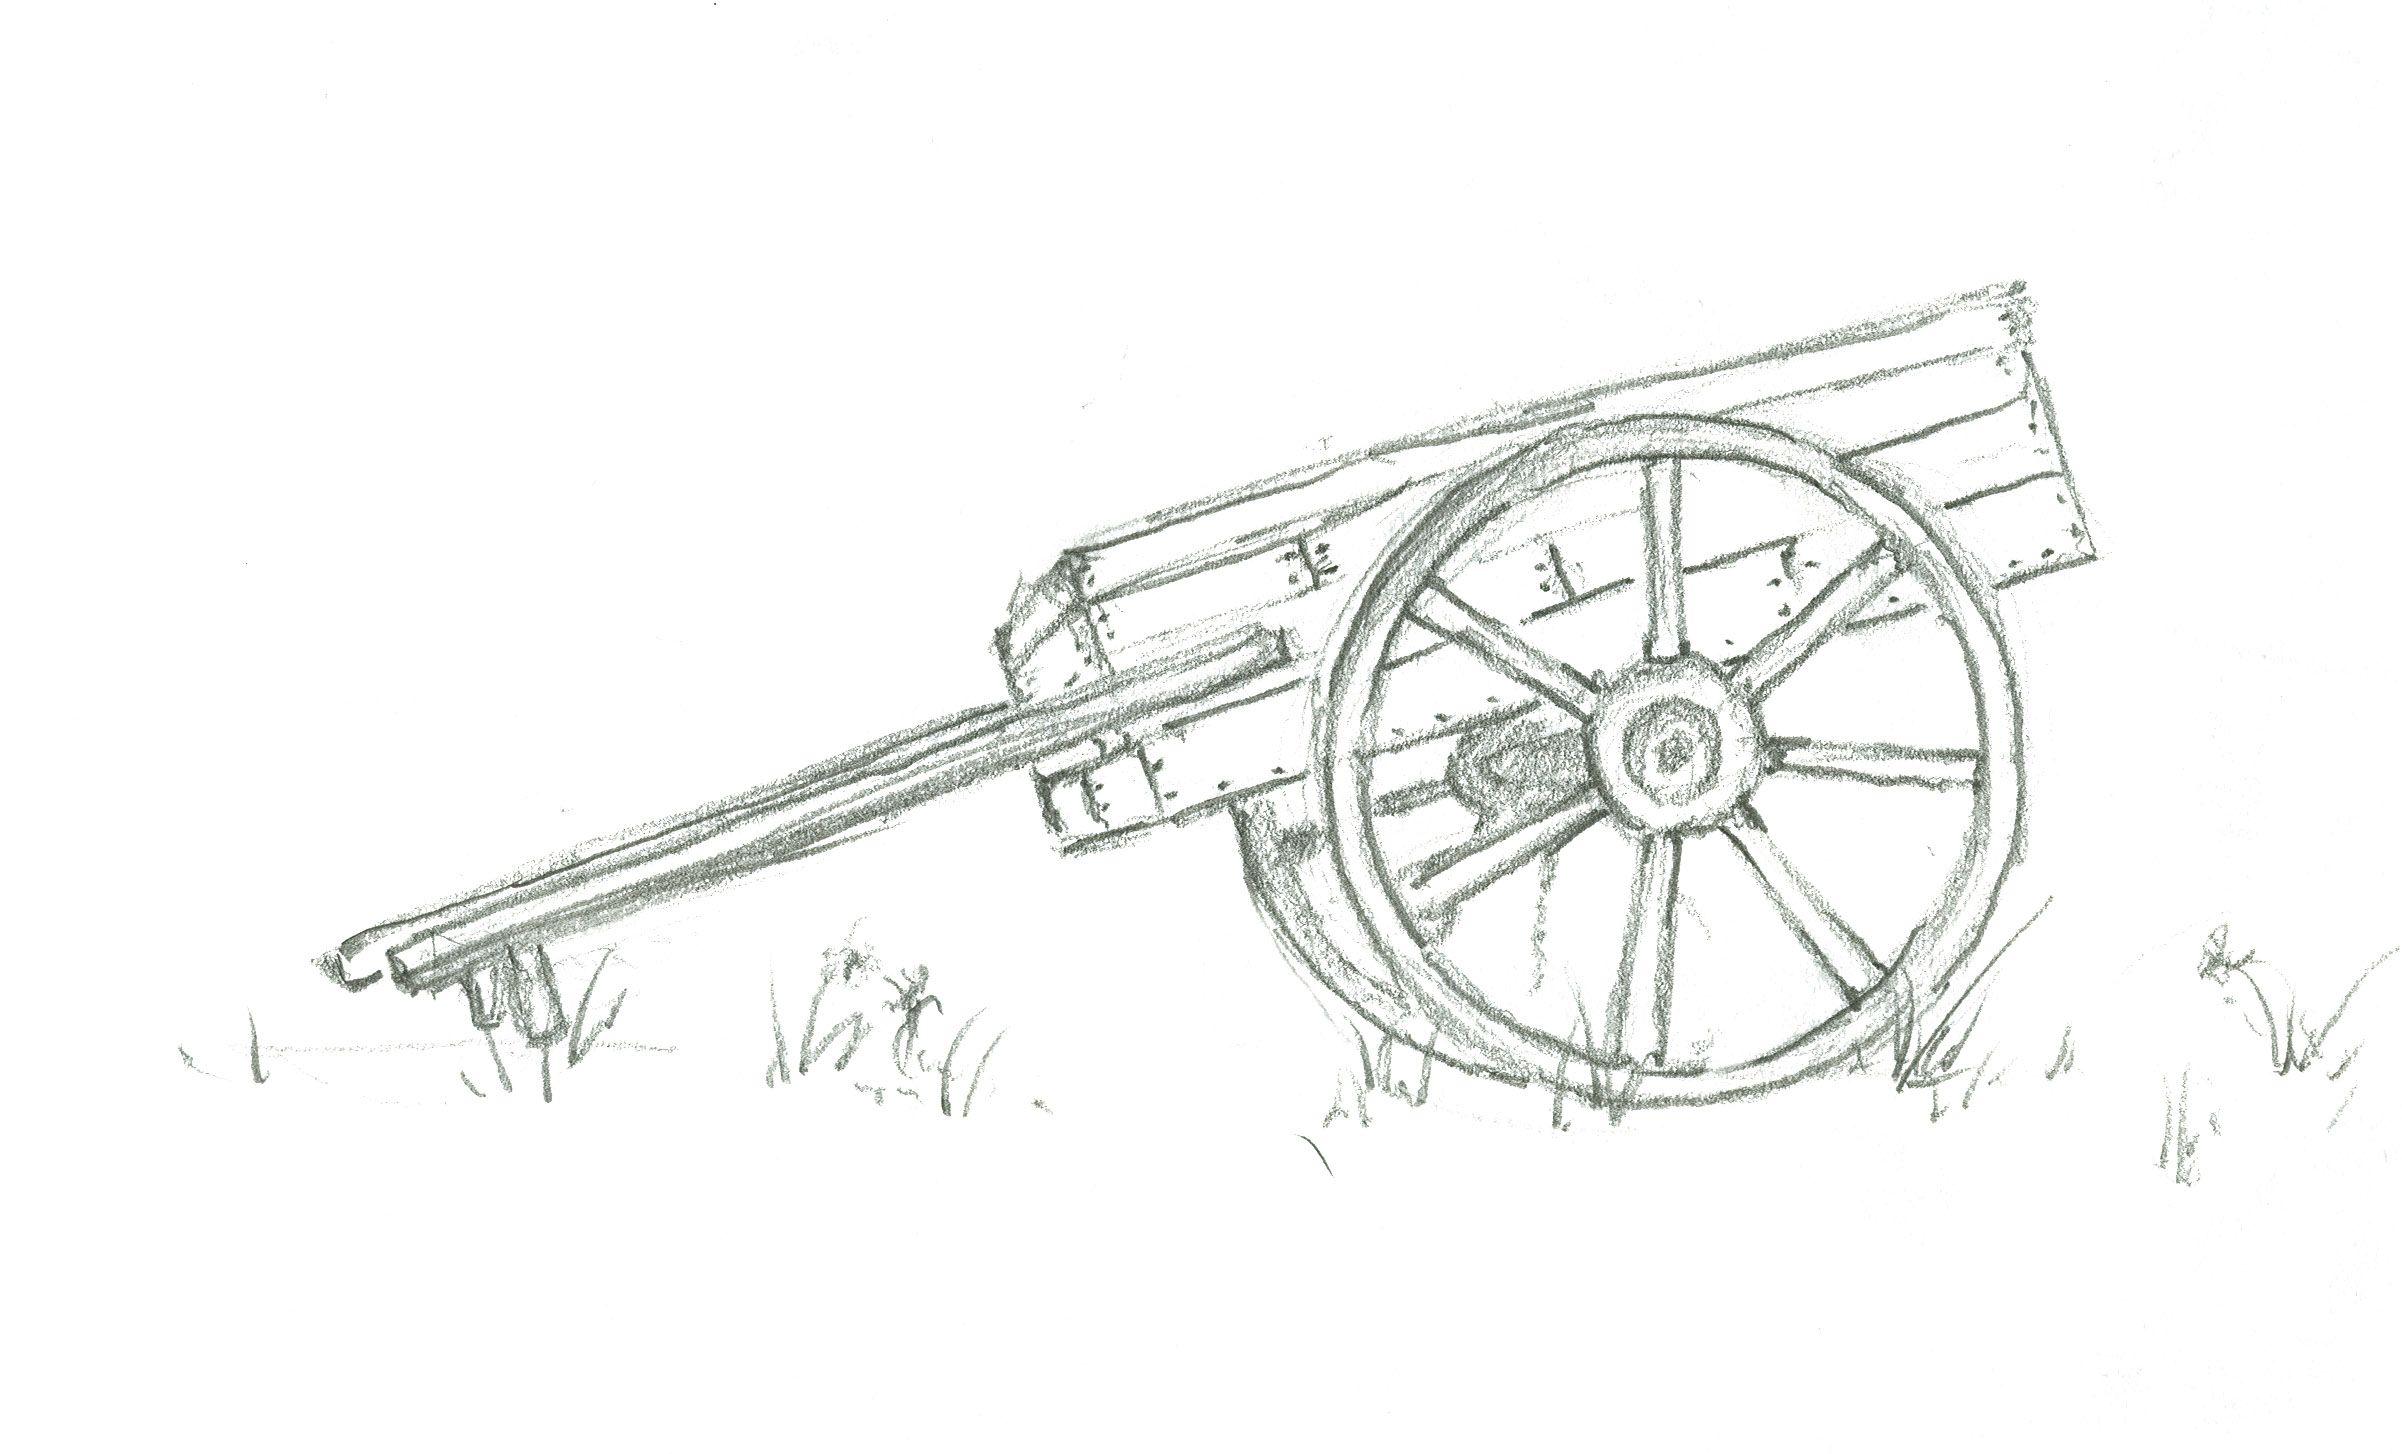 Cart handcart clip art. Wagon clipart pioneer trek